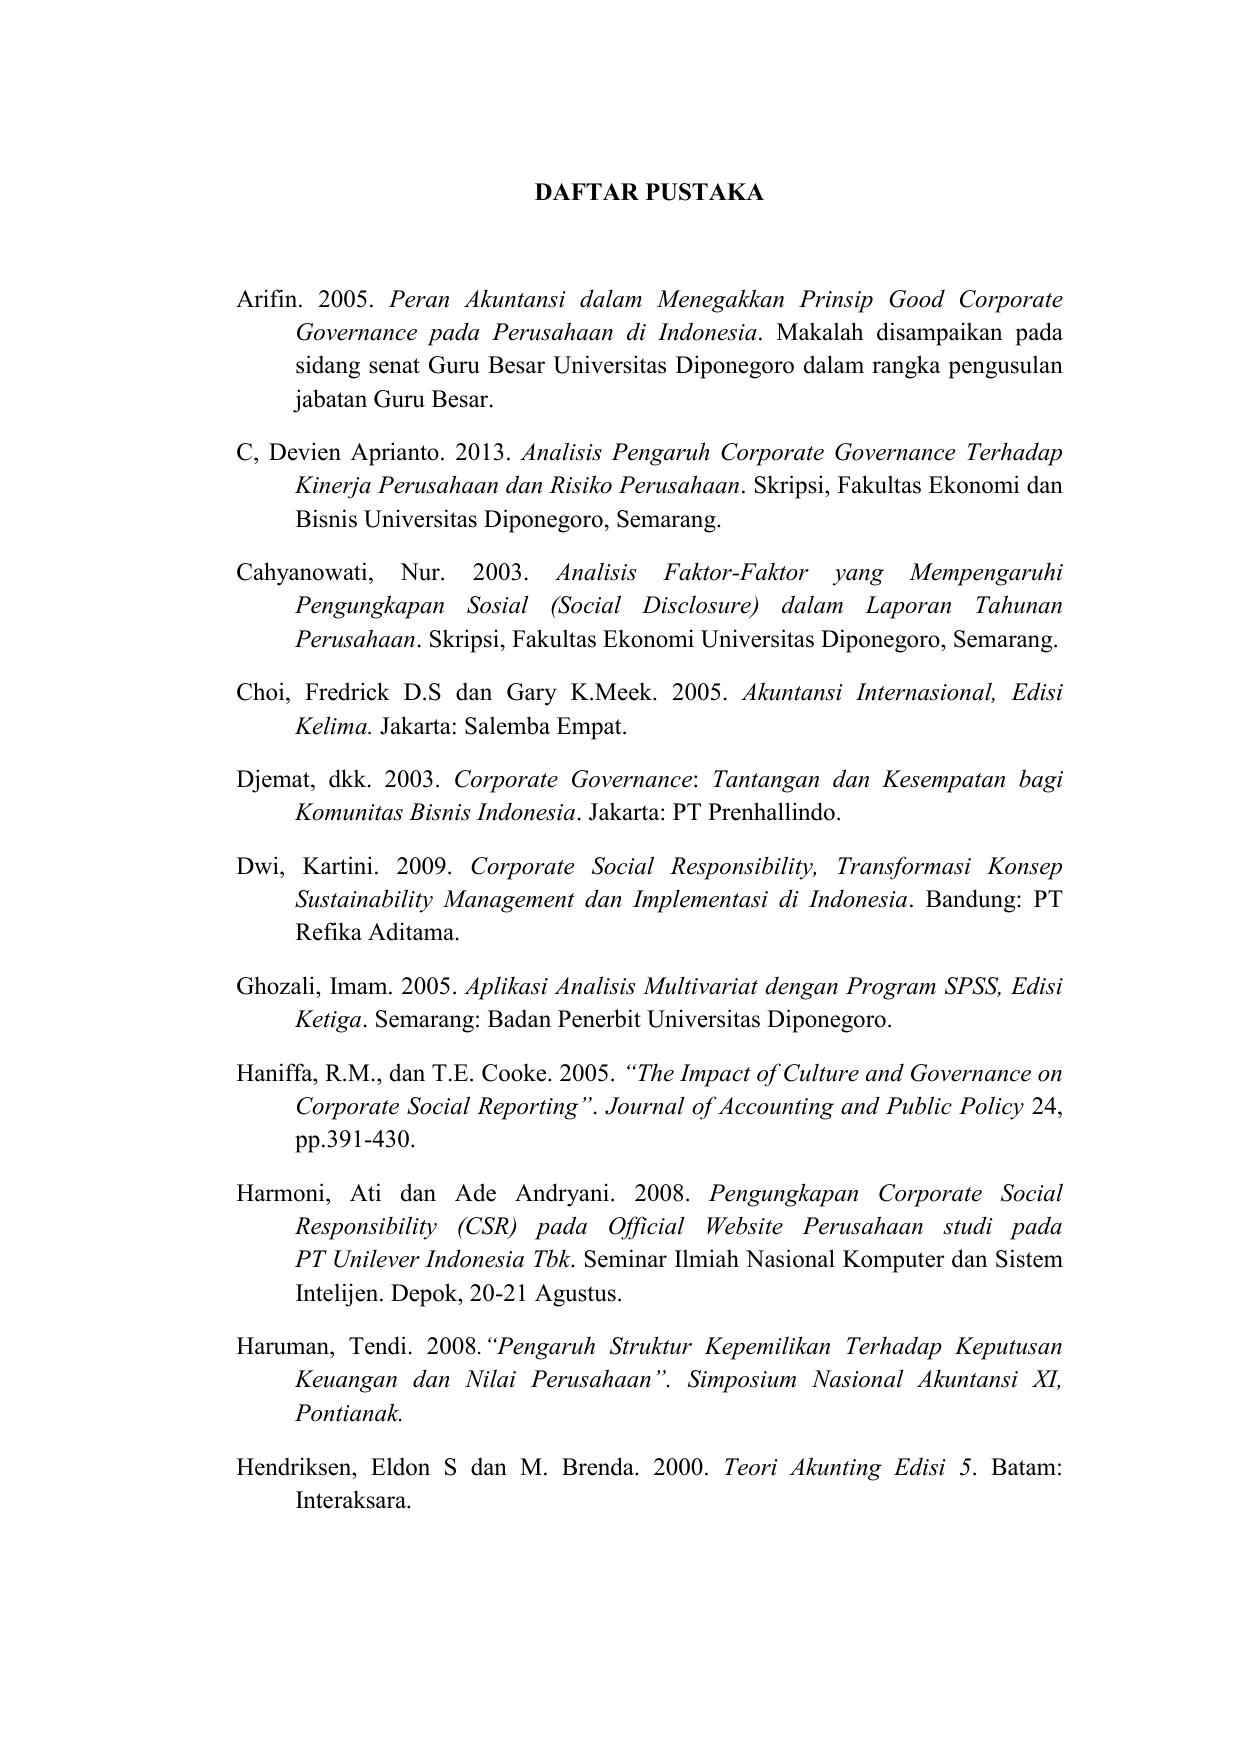 Daftar Pustaka Skripsi Akuntansi Keuangan لم يسبق له مثيل الصور